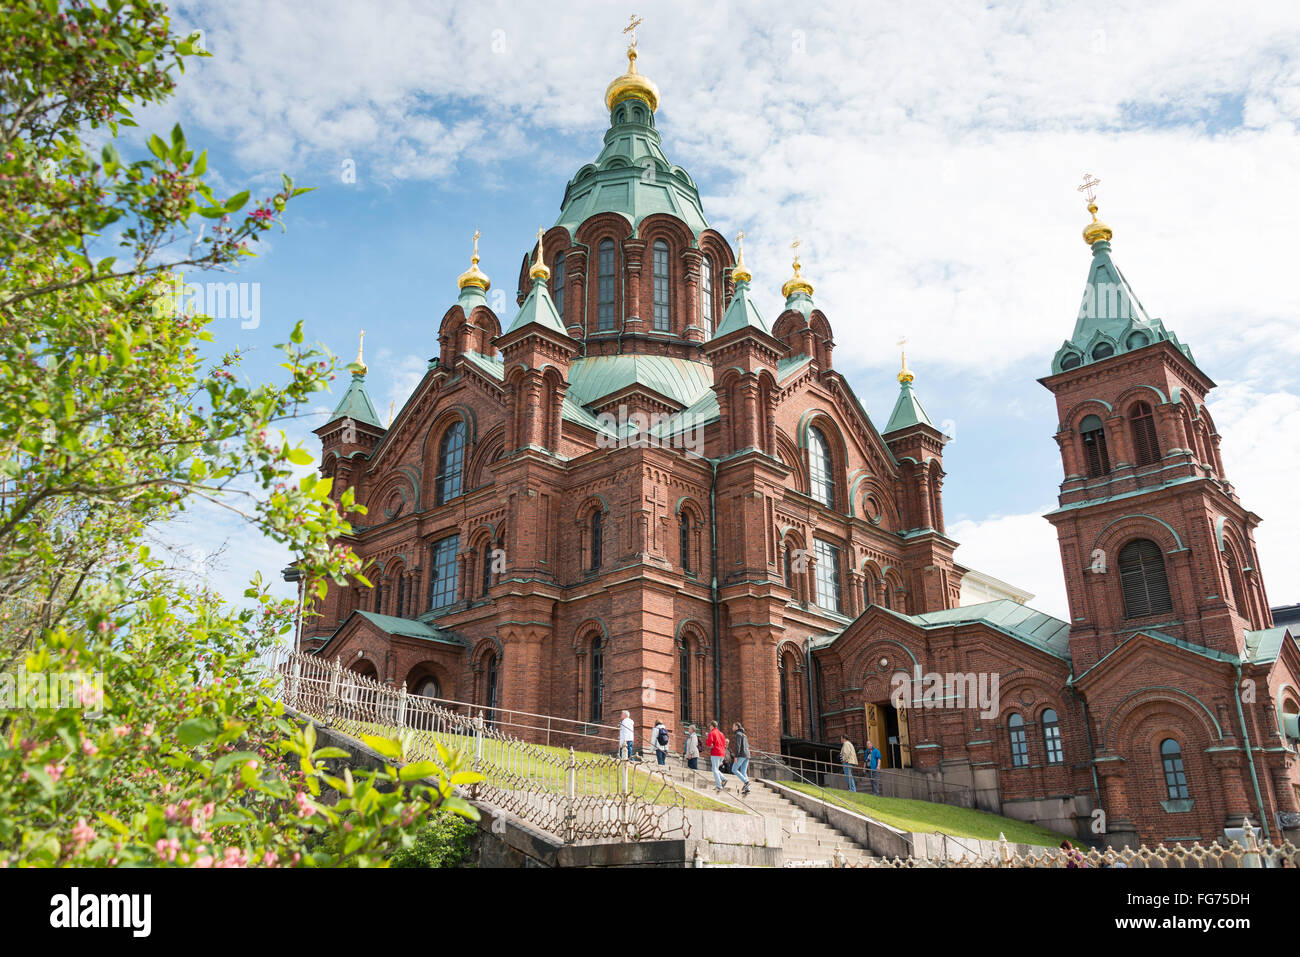 Uspenski Orthodox Cathedral (Uspenskin katedraali), Kanavakatu, Helsinki, Uusimaa Region, Republic of Finland - Stock Image